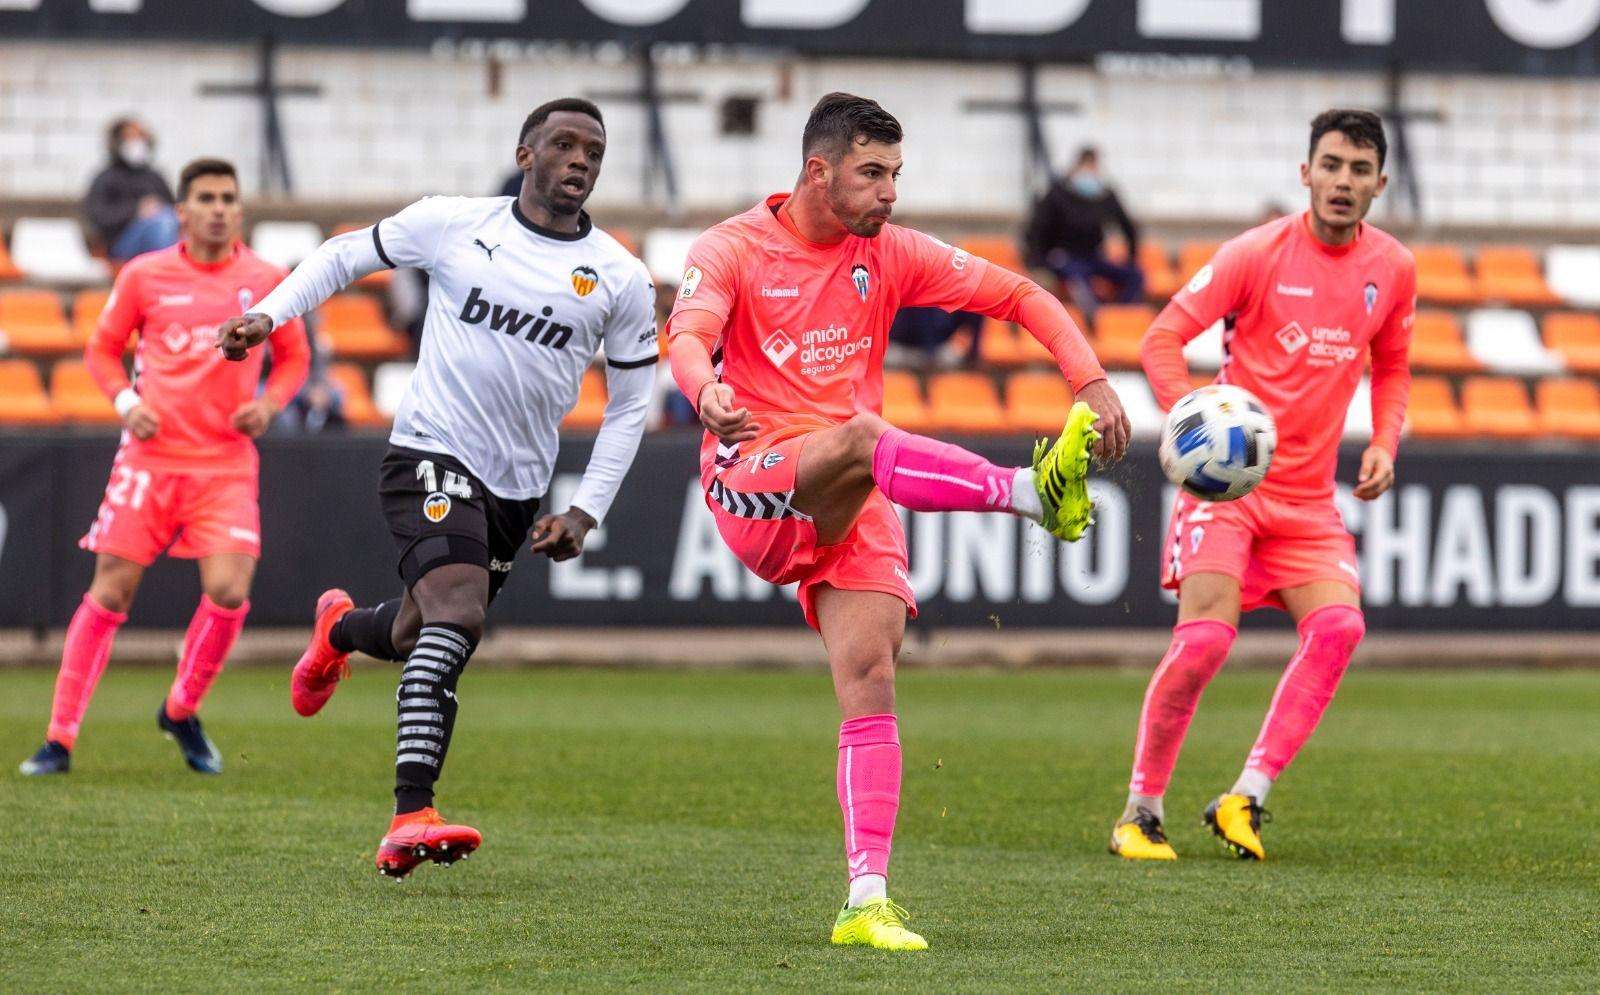 Mestalla-Alcoyano: Perfect week for Alcoyano